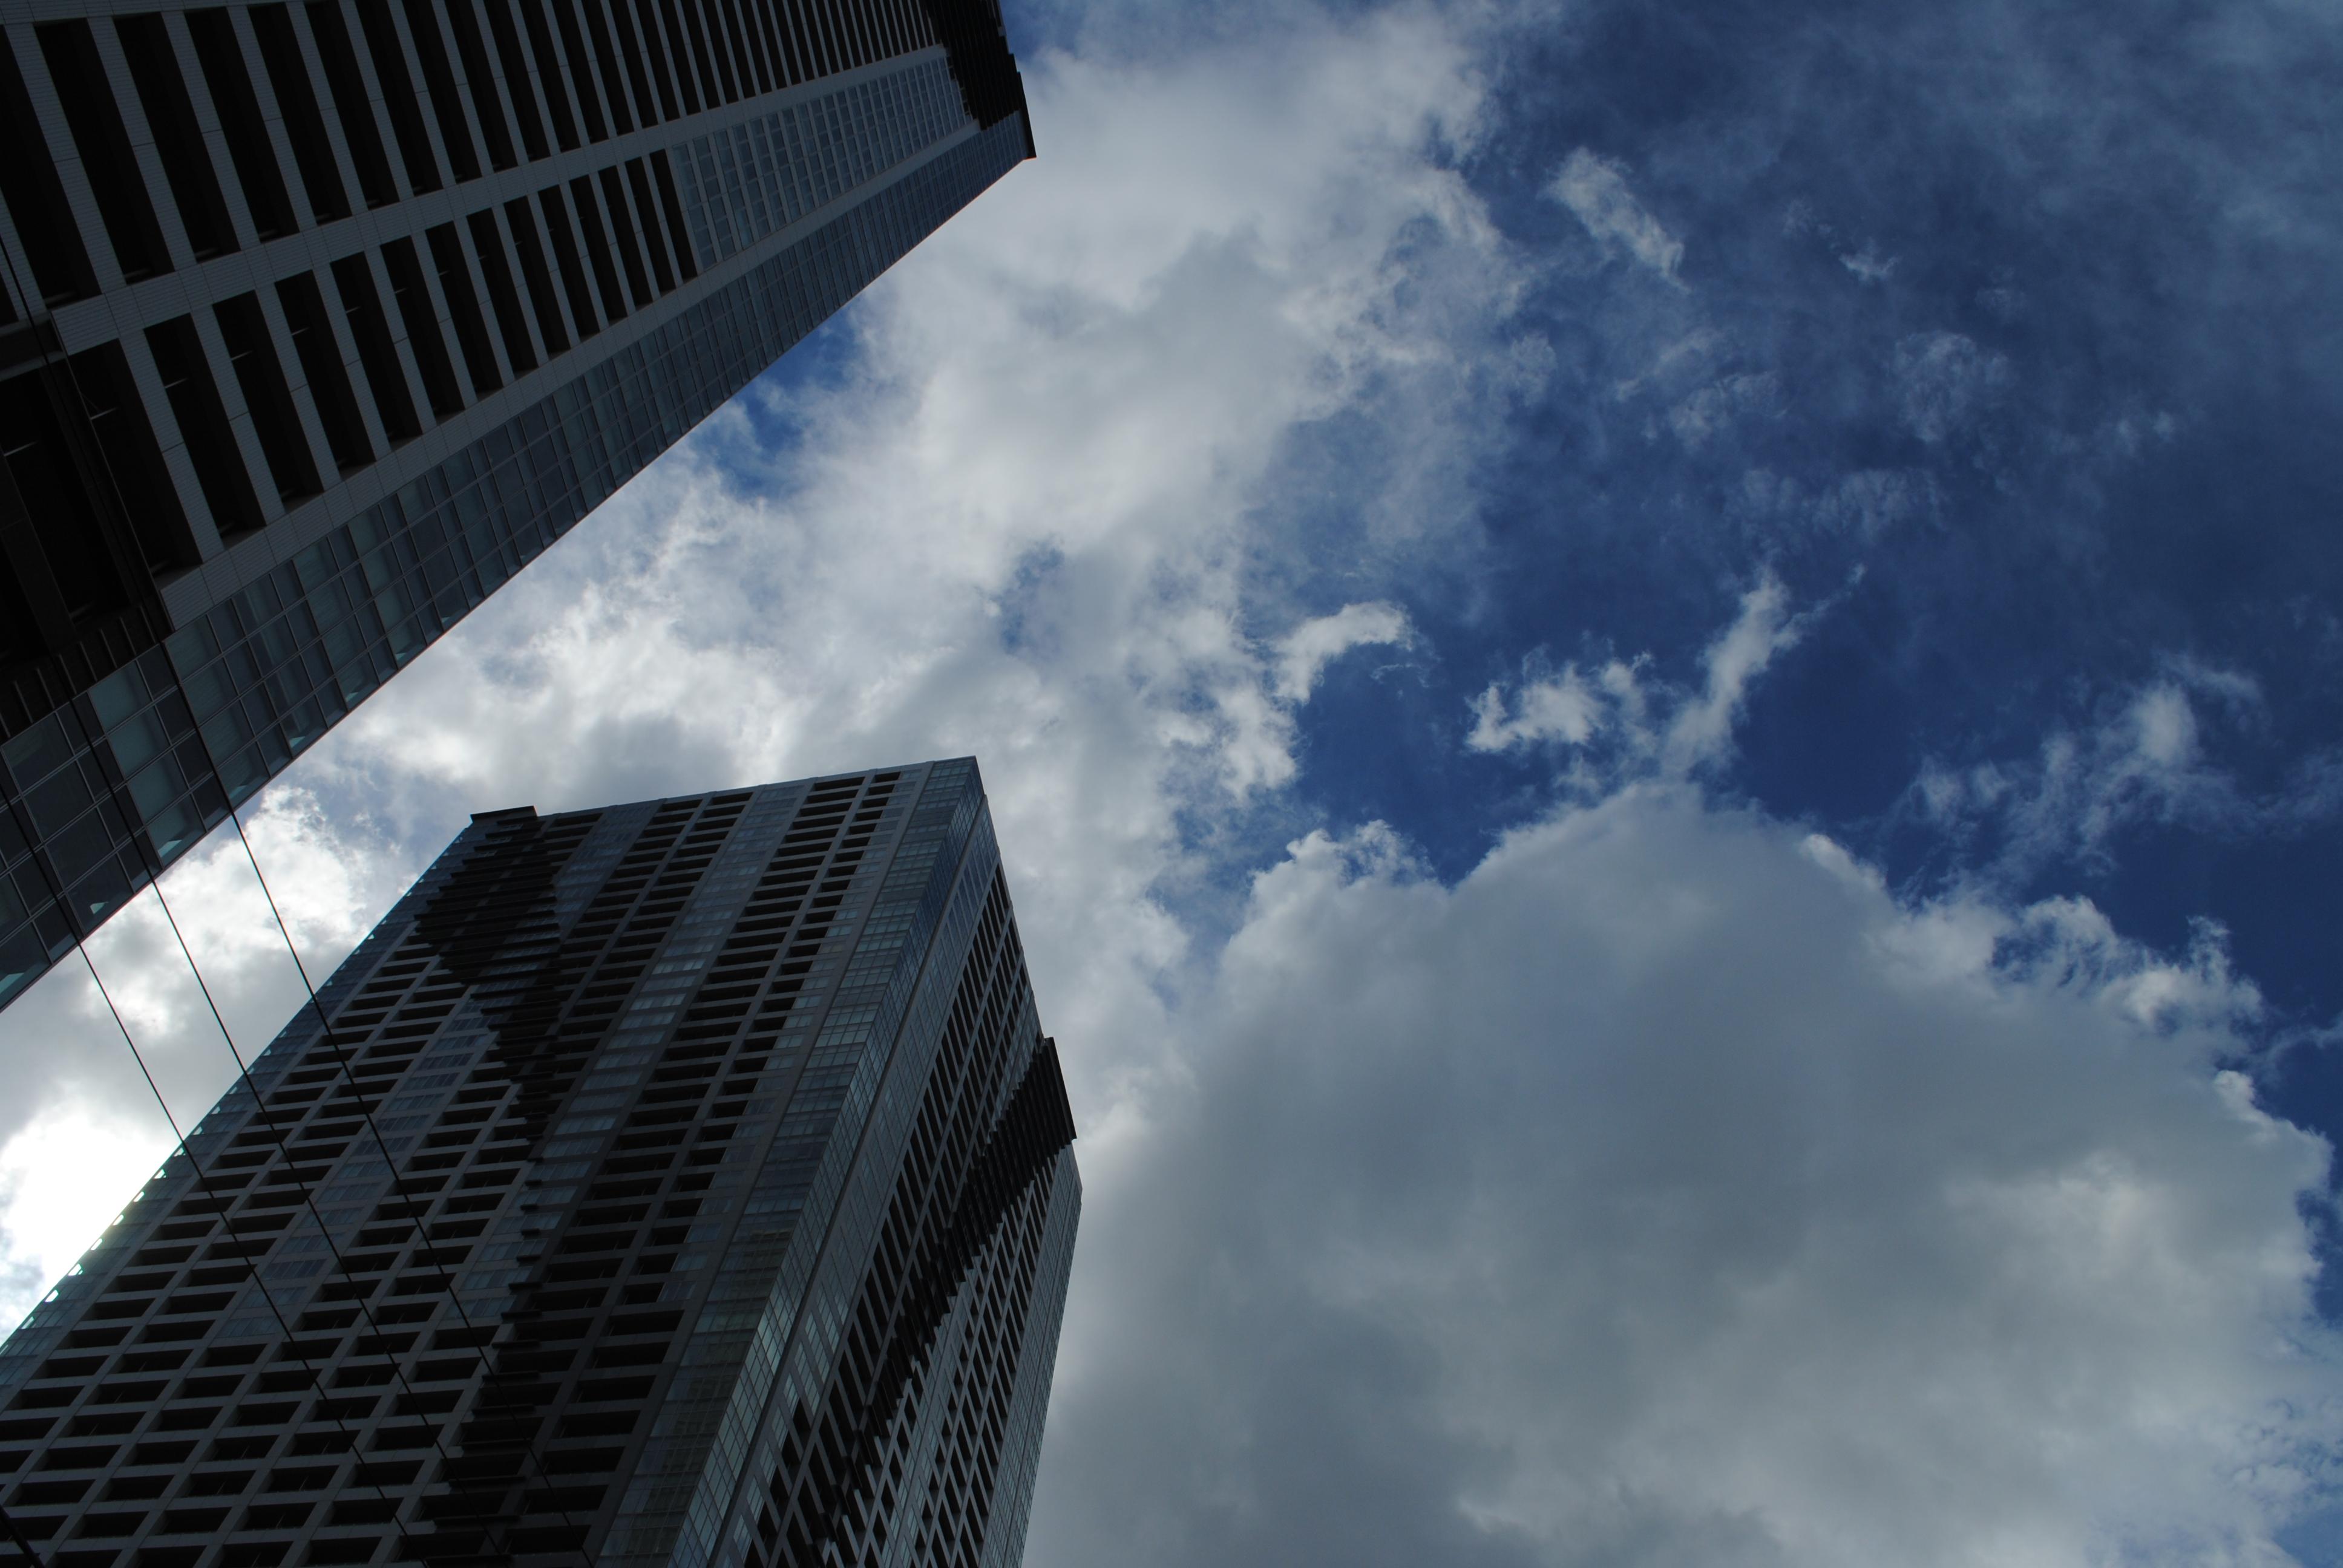 <b>風は強いし好天とは言えないが、雲間から見える空は夏とは思えないクリアな青。マイナス補正したらかなりこてこてに仕上がった<br>AF-S DX NIKKOR 18-55mm F3.5-5.6 G VR / 3,872×2,592 / 1/500秒 / F11 / -1EV / ISO100 / WB:晴天 / 18mm</b>